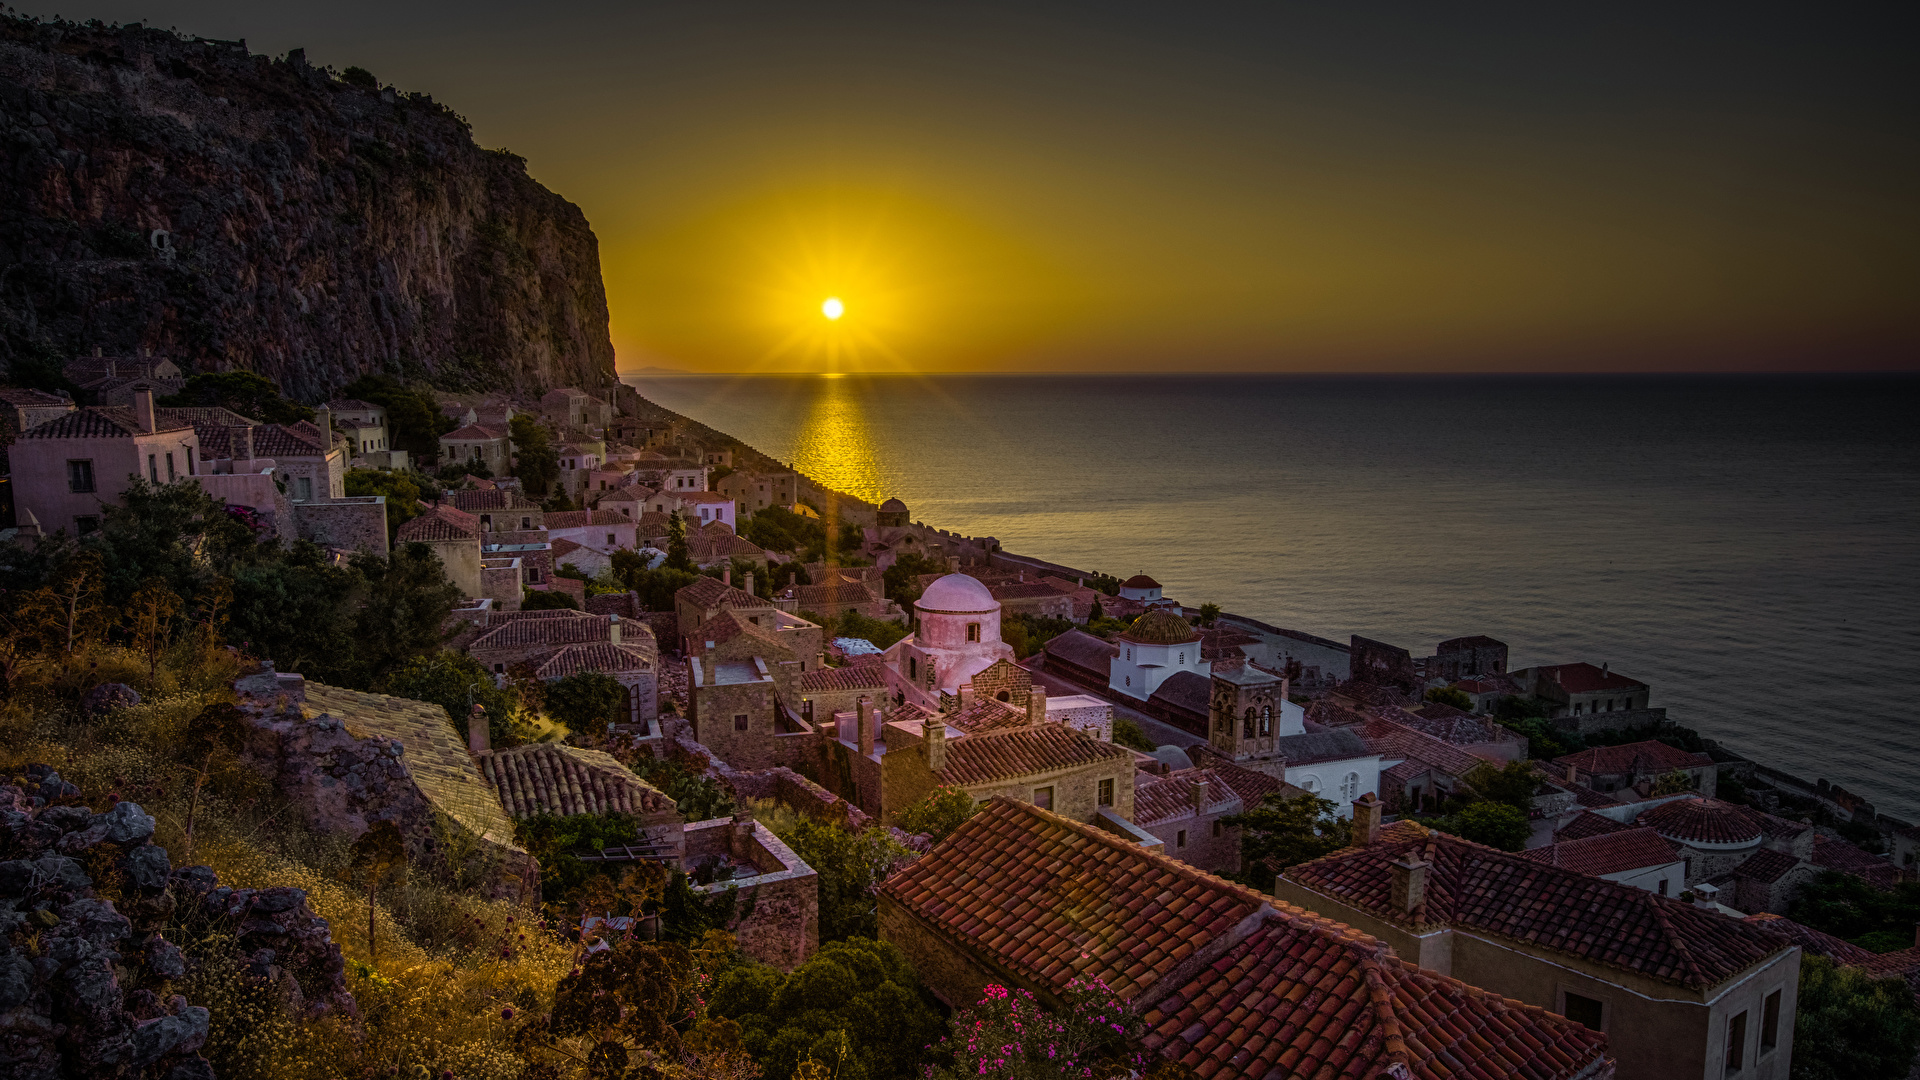 Photos Greece Monemvasia Sun Sea Roof Rock Sunrises and 1920x1080 1920x1080